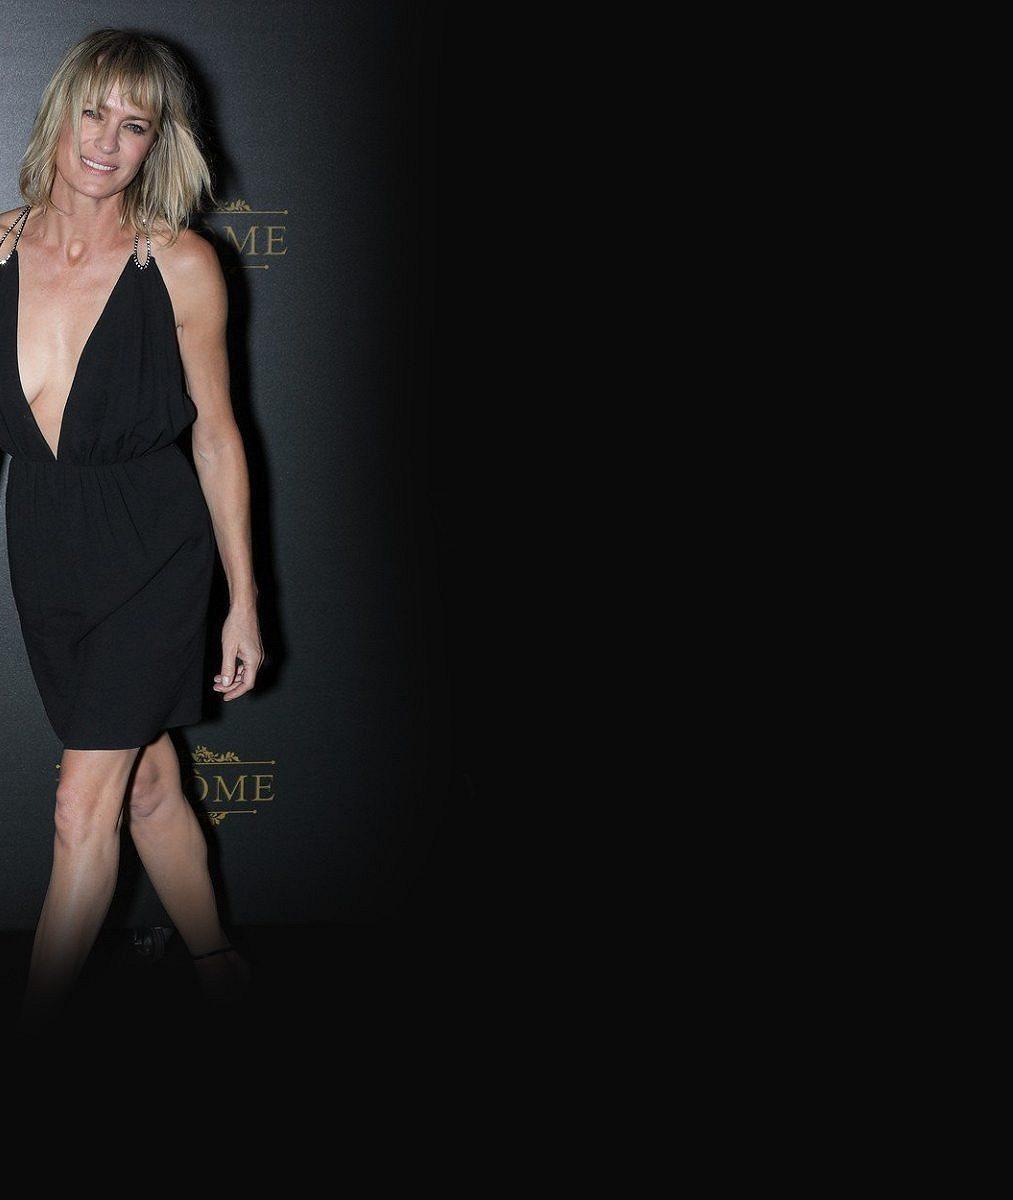 Po padesátce ji odvaha neopustila: Známá herečka v šatech s obrovským výstřihem konkurovala i Naomi Campbell